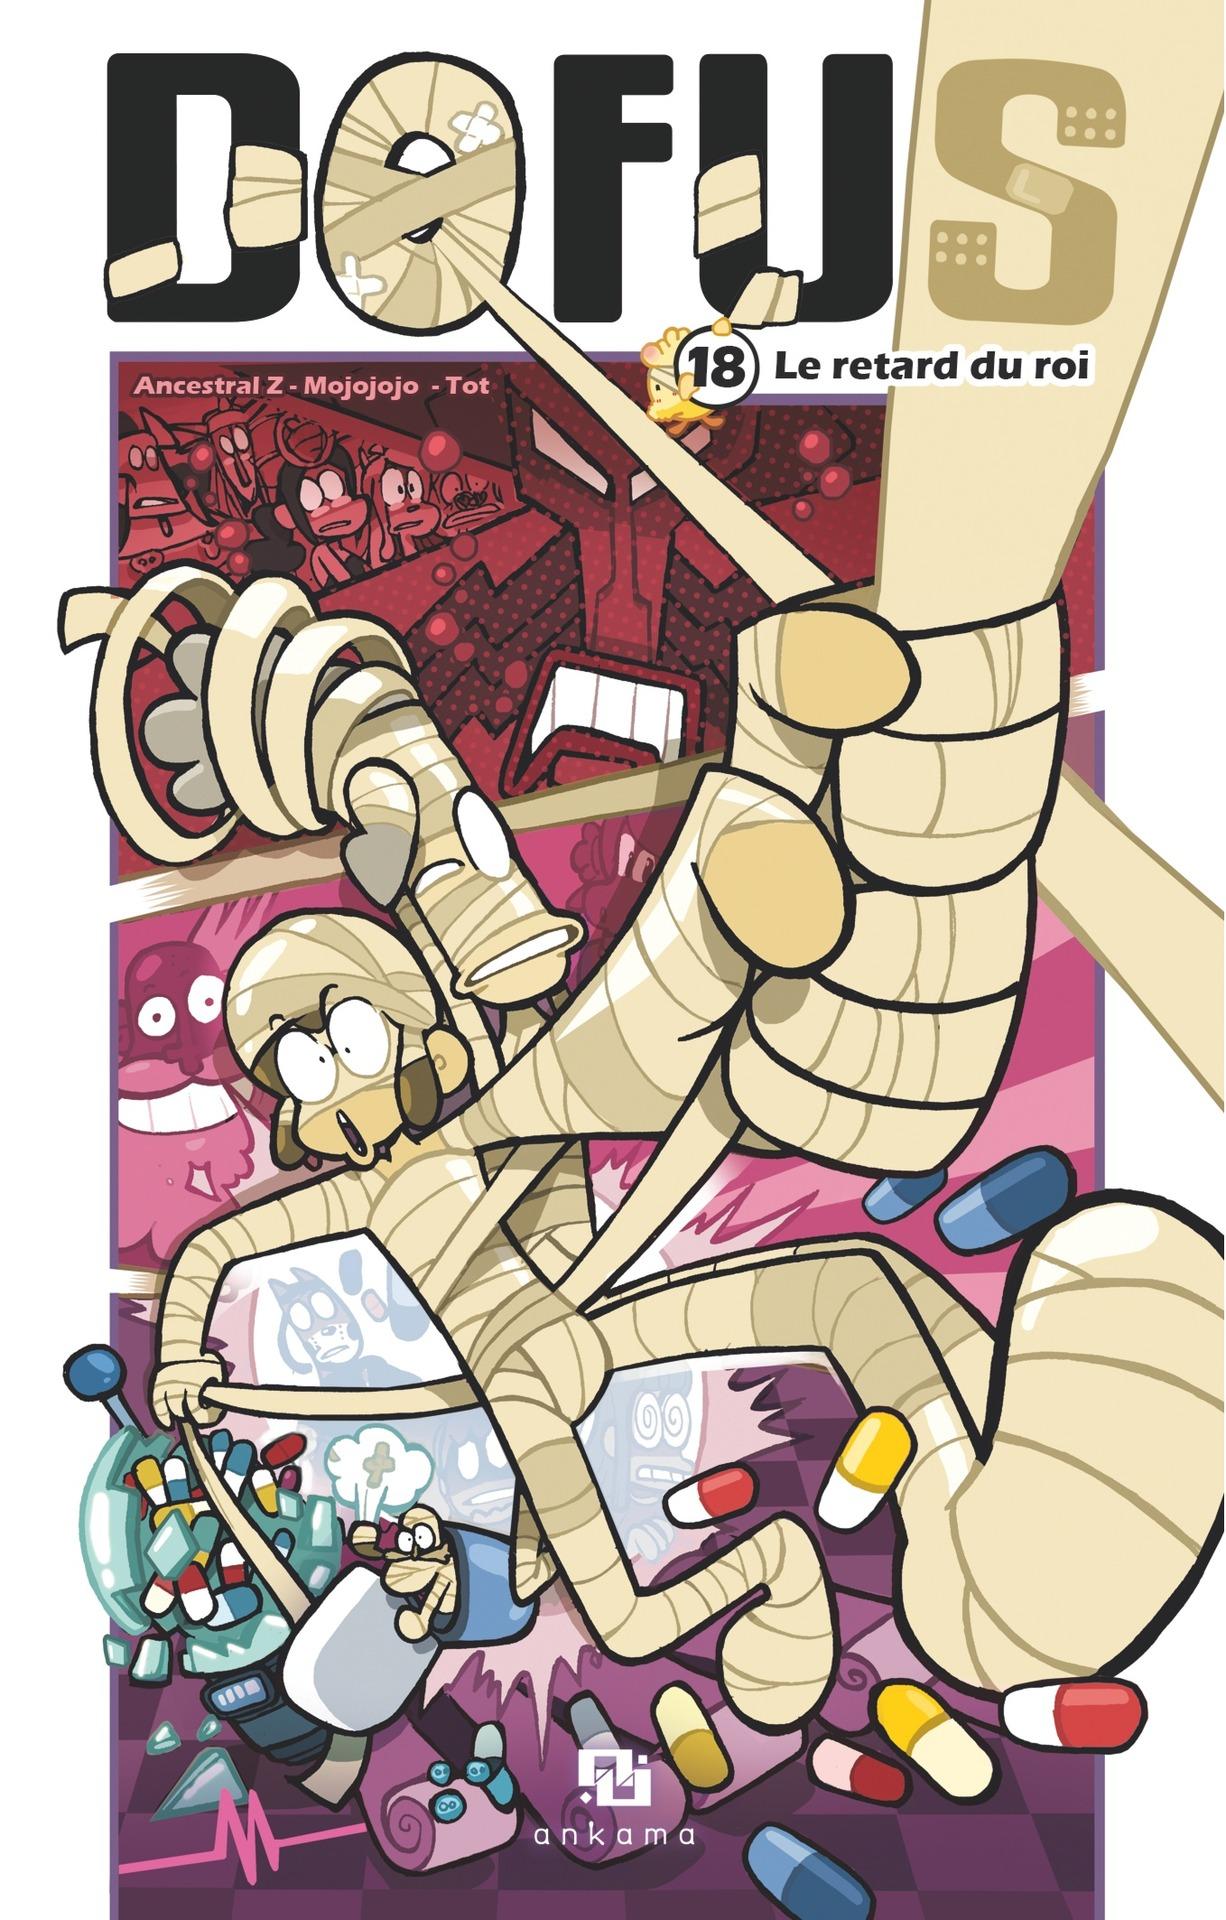 Dofus Manga - Tome 18 - Le Retard du roi